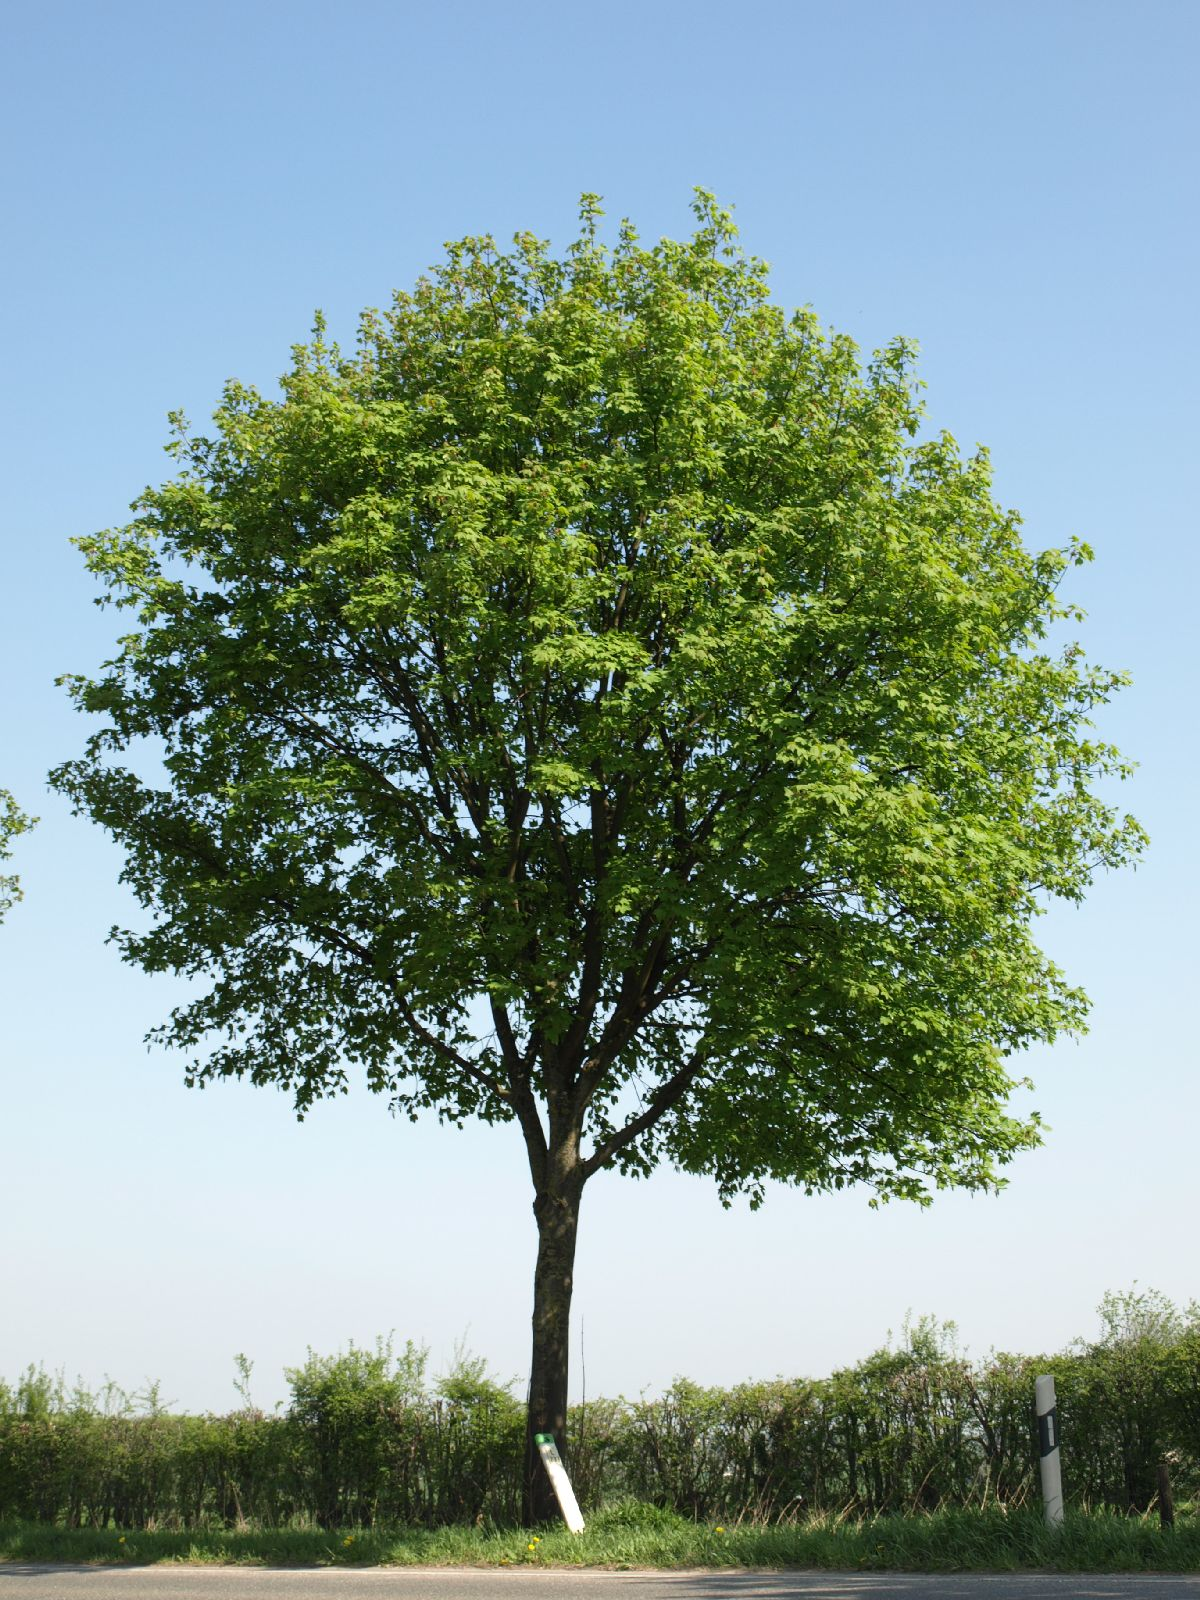 Plants-Trees_Photo_Texture_B_P4212521